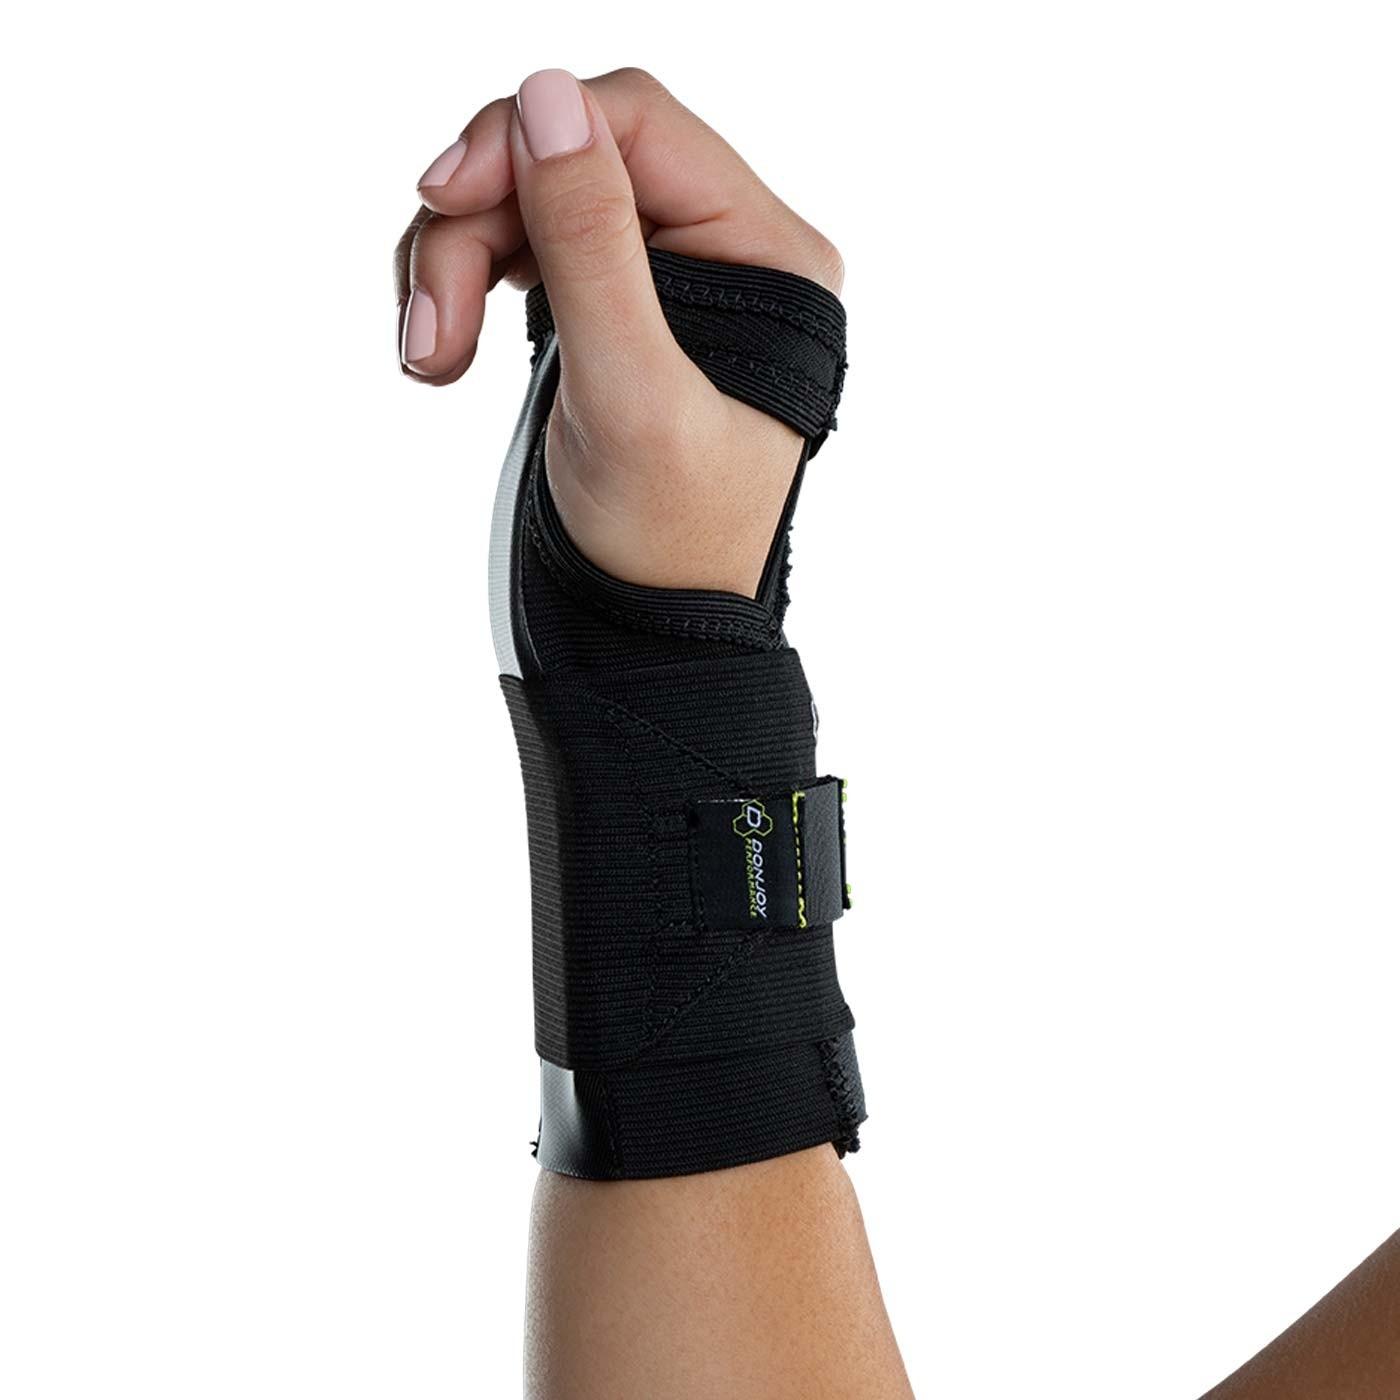 Donjoy Performance Bionic Elastic Wrist Brace Medium Support Posture Corrector Shoulder Elastis Previous